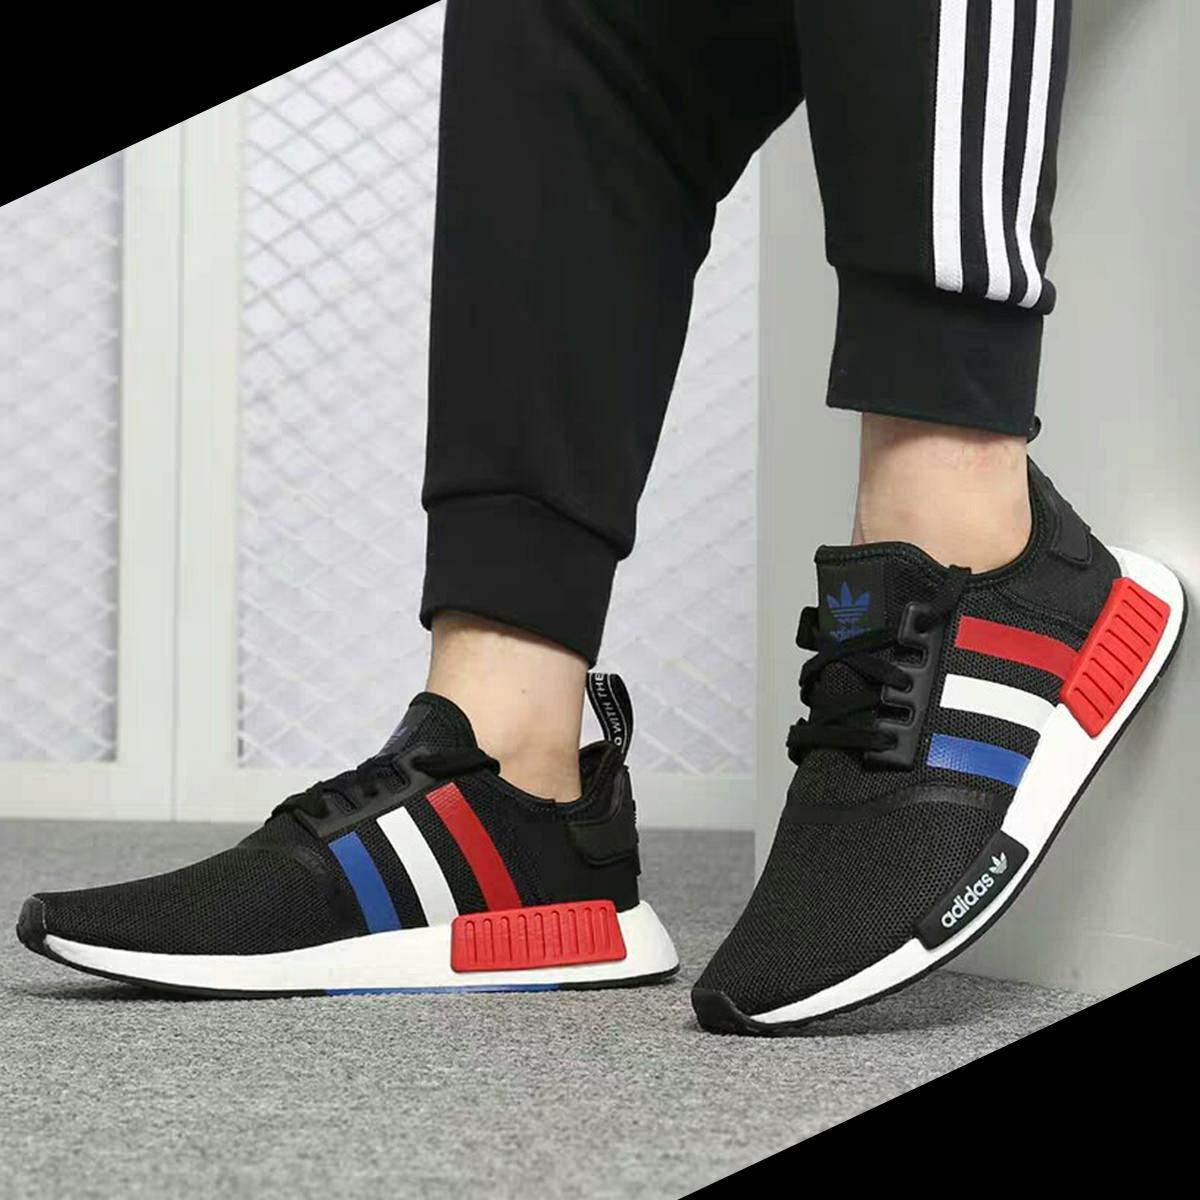 Adidas NMD R1 Tri Colour UK Size 9